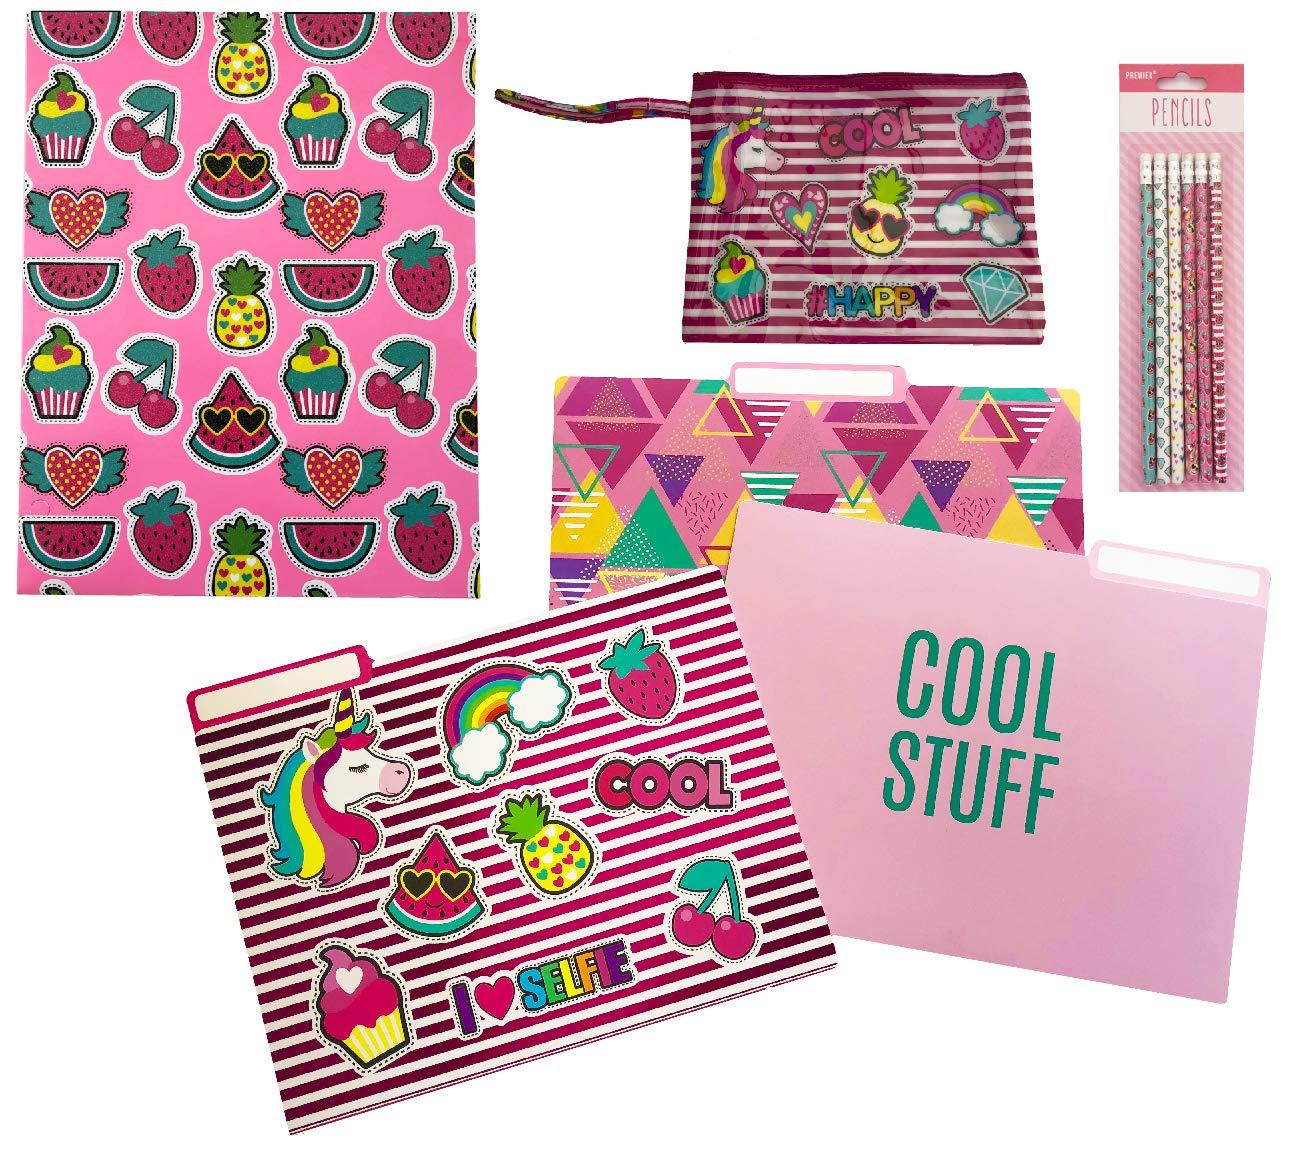 Fashion Office/Back to School Folder, File folders, Pencil Pouch & Pencils Set. Fun Fruit, Unicorn, Cupcake Patch Artwork.